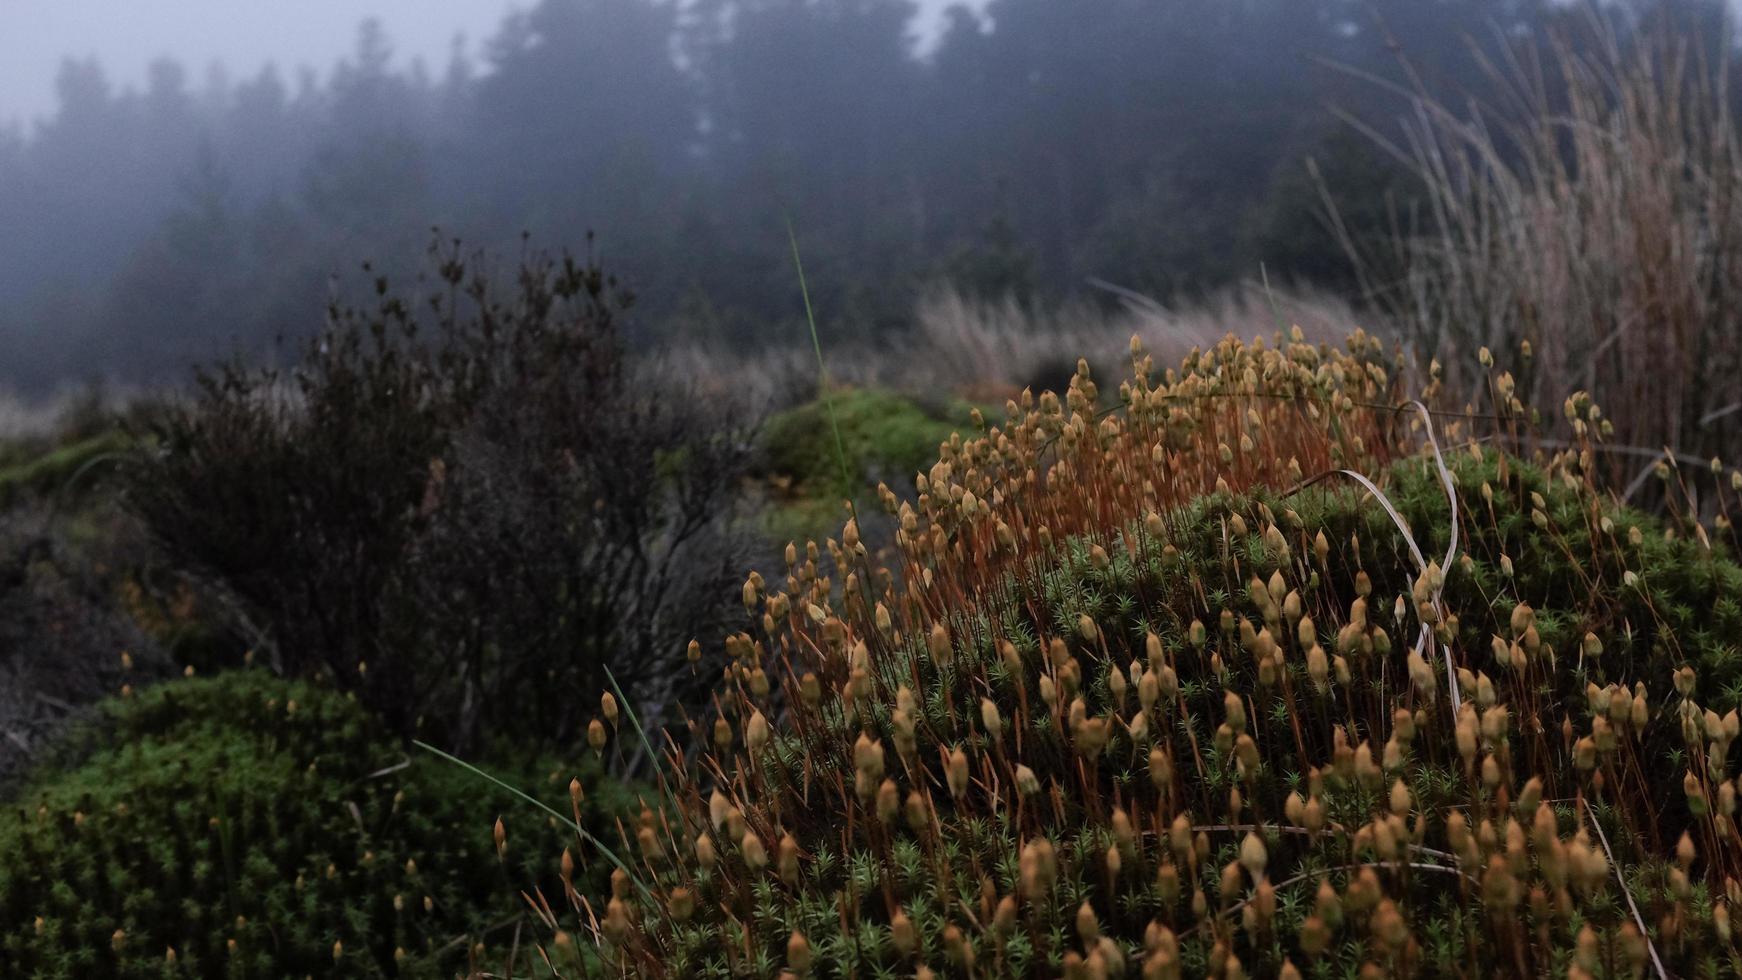 Grassy fall field photo